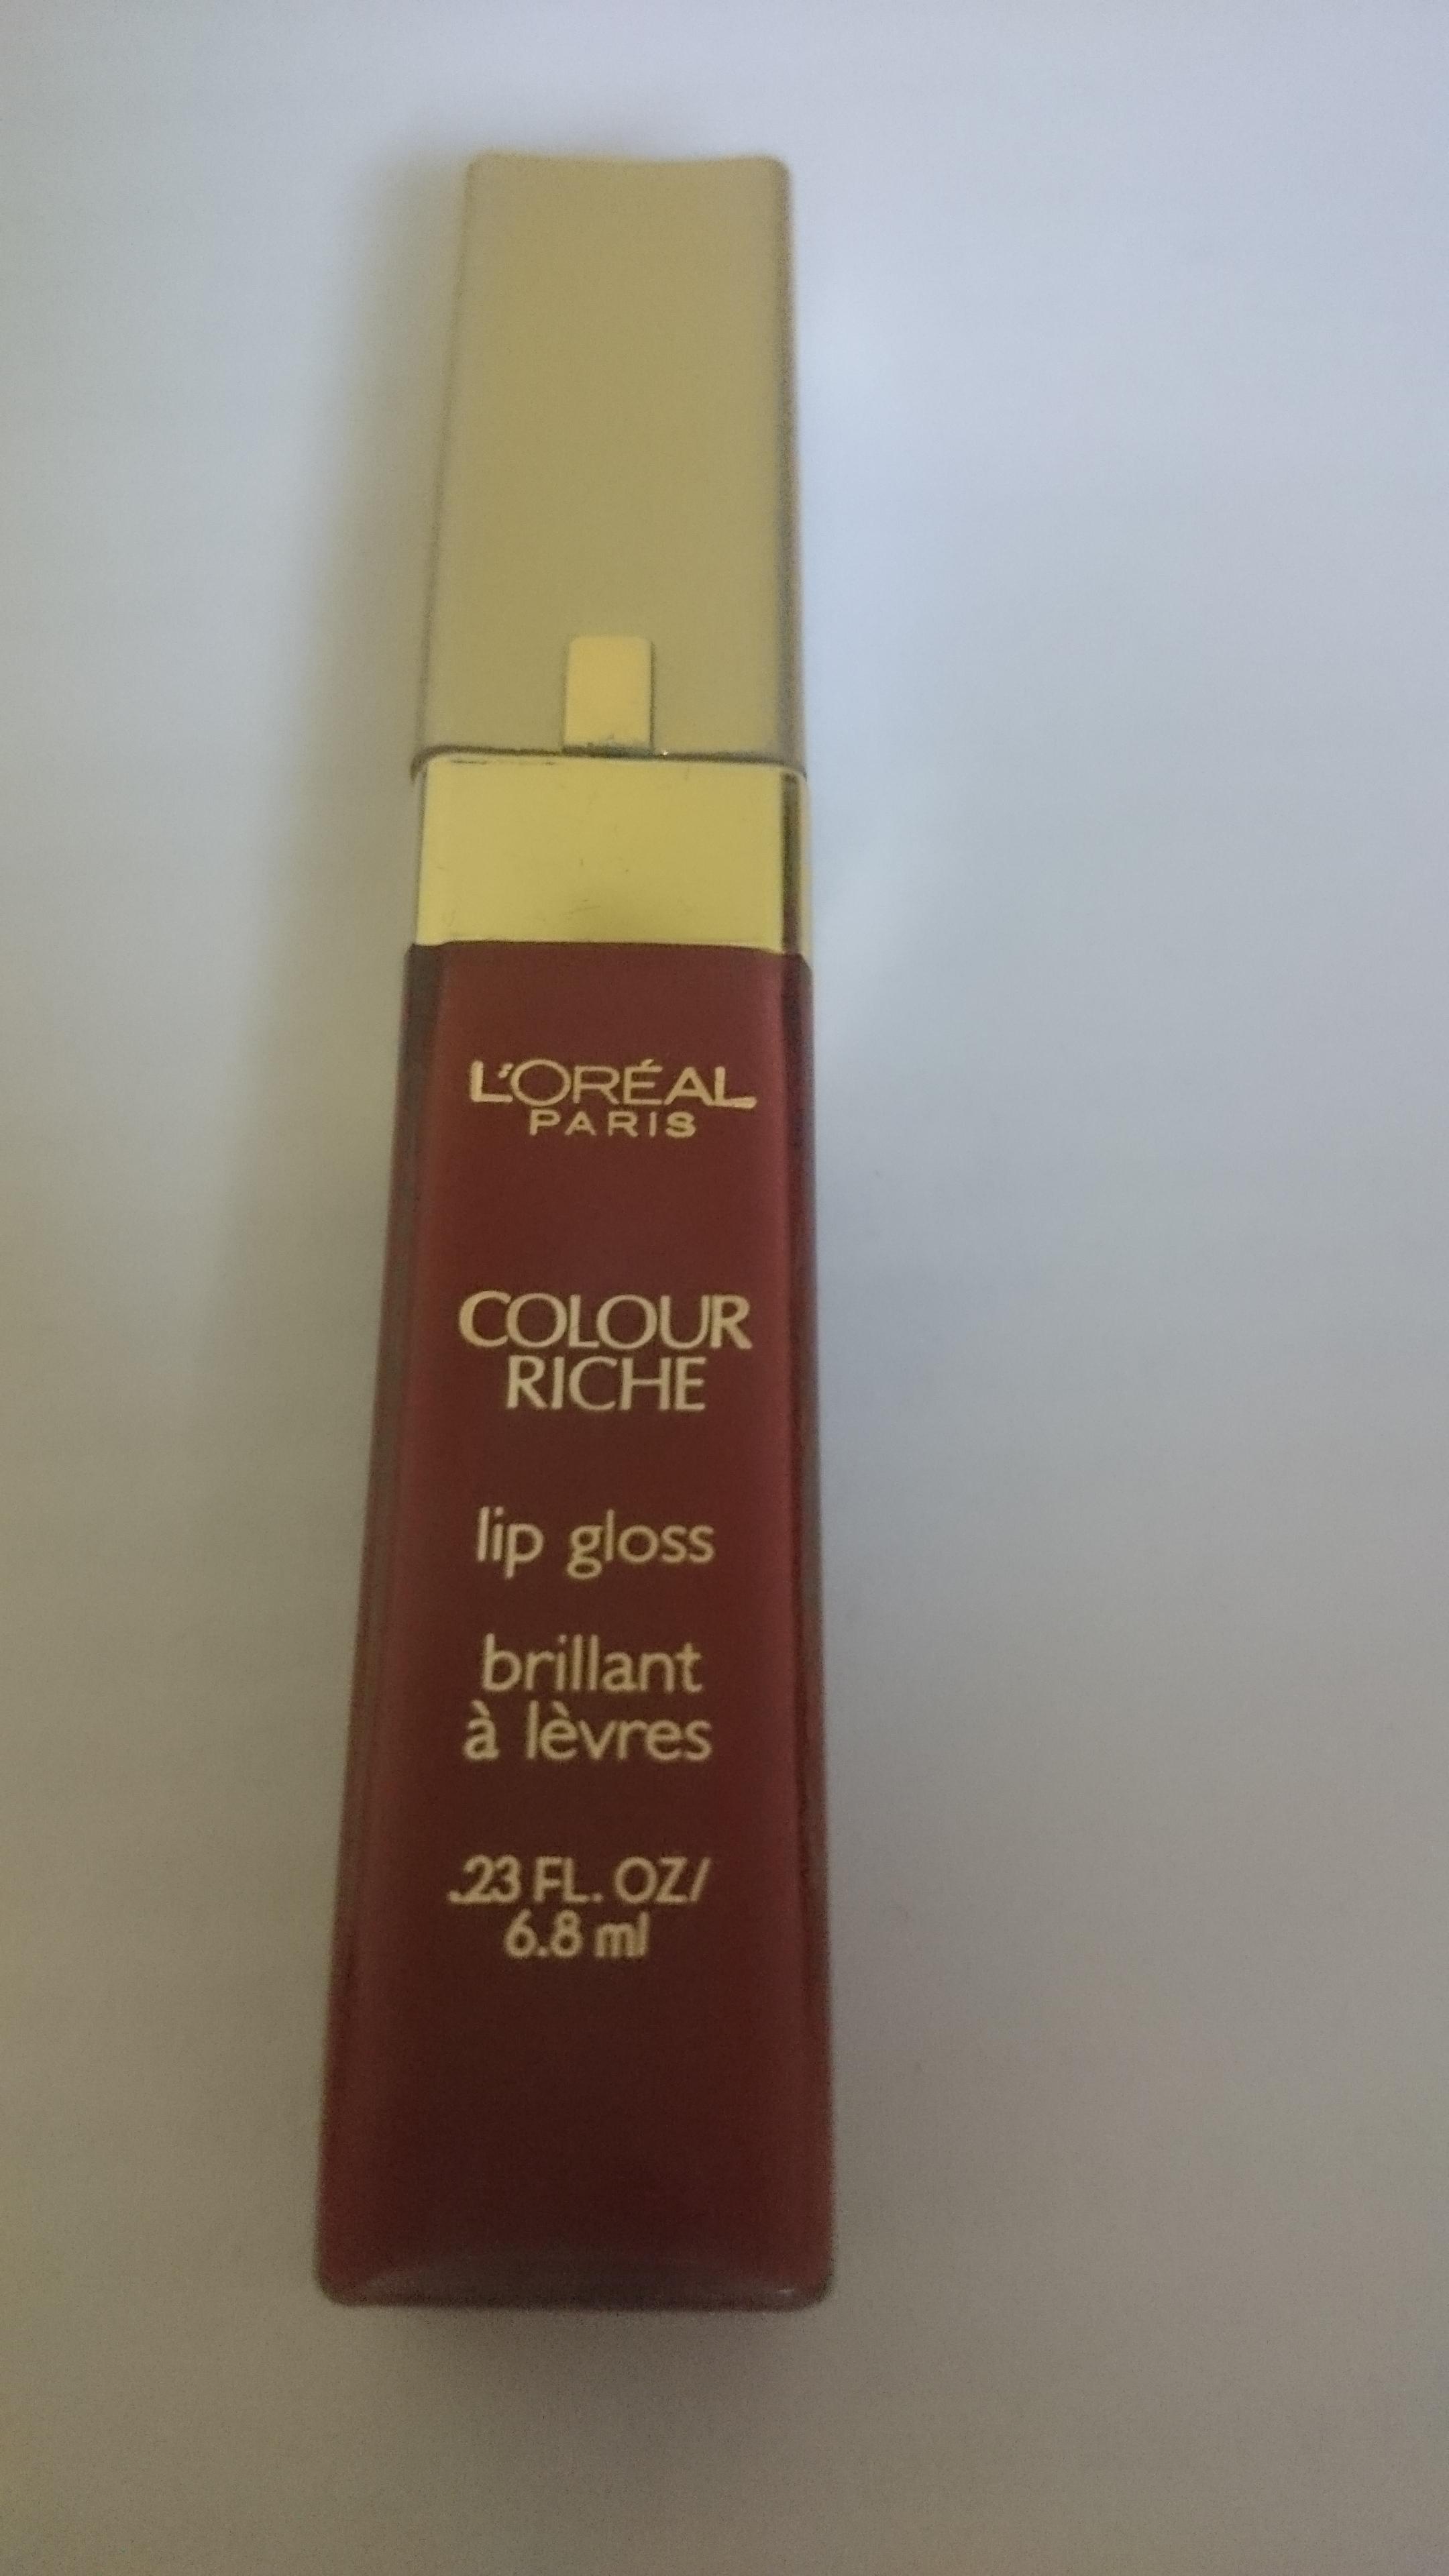 Colour Riche Lip Gloss 23 Fl Oz Tube uploaded by Kiran S.